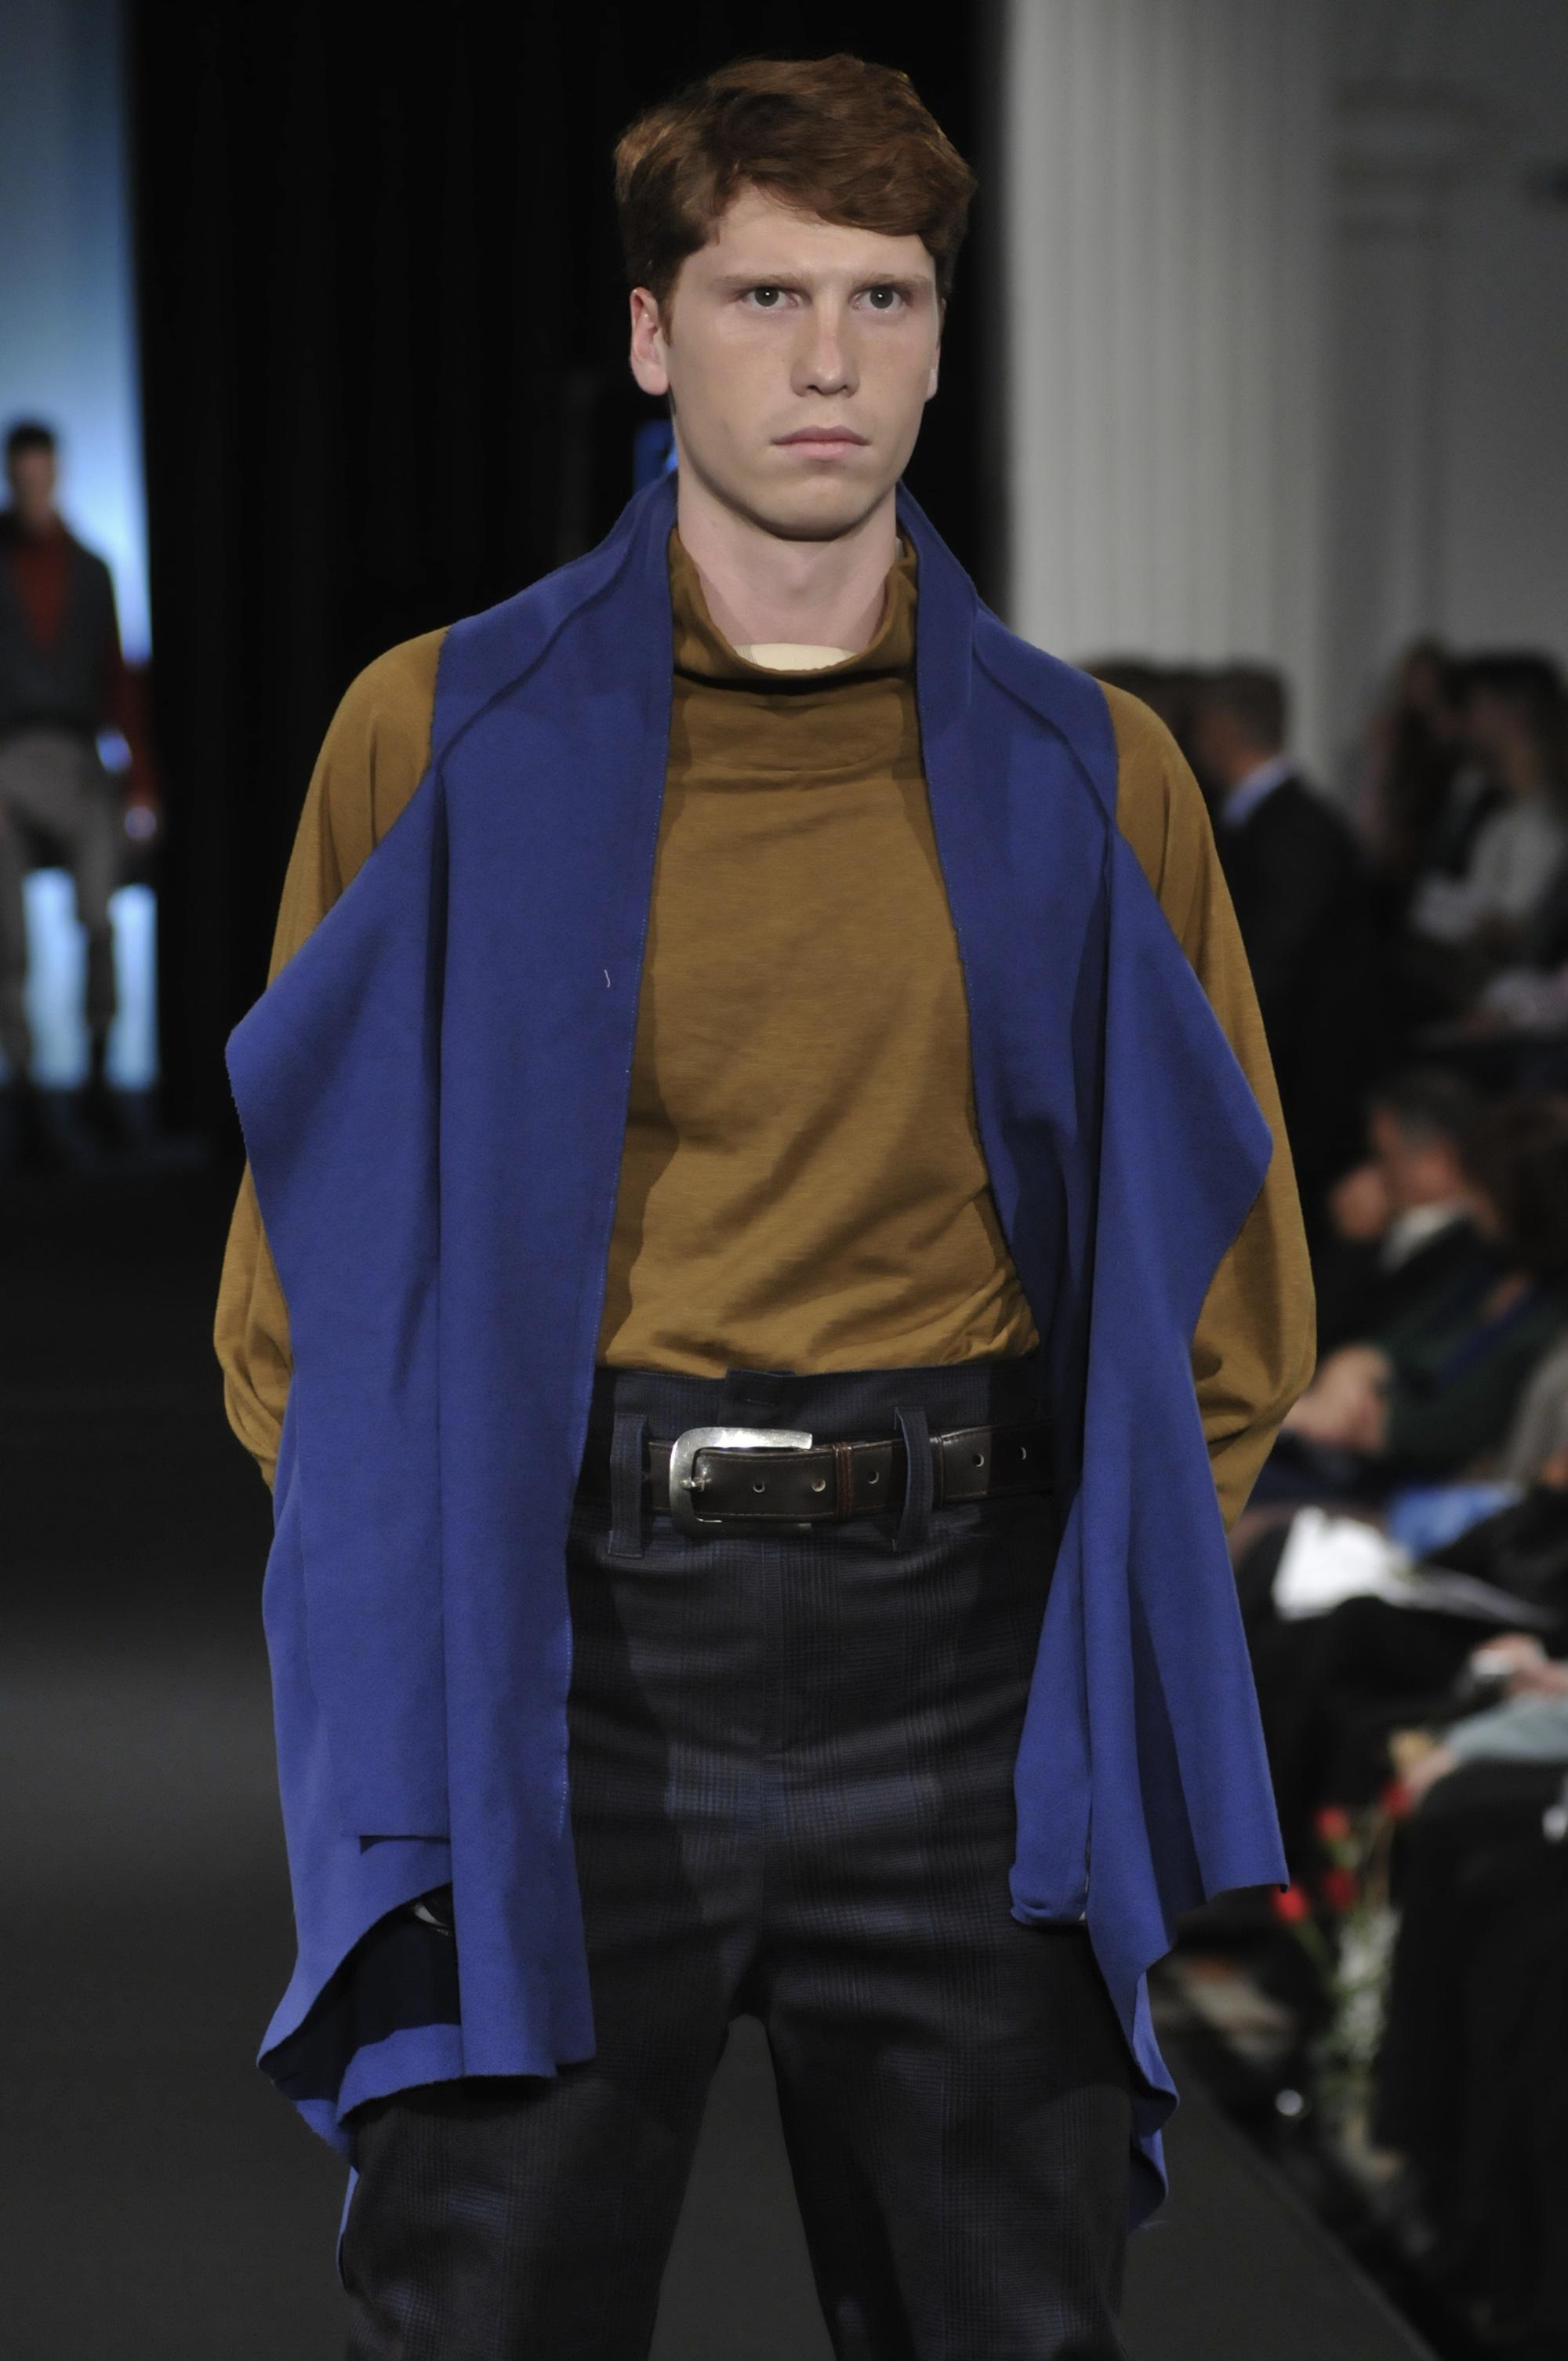 teodora zivkovic fpu 30. Amstel Fashion Week: 2. veče